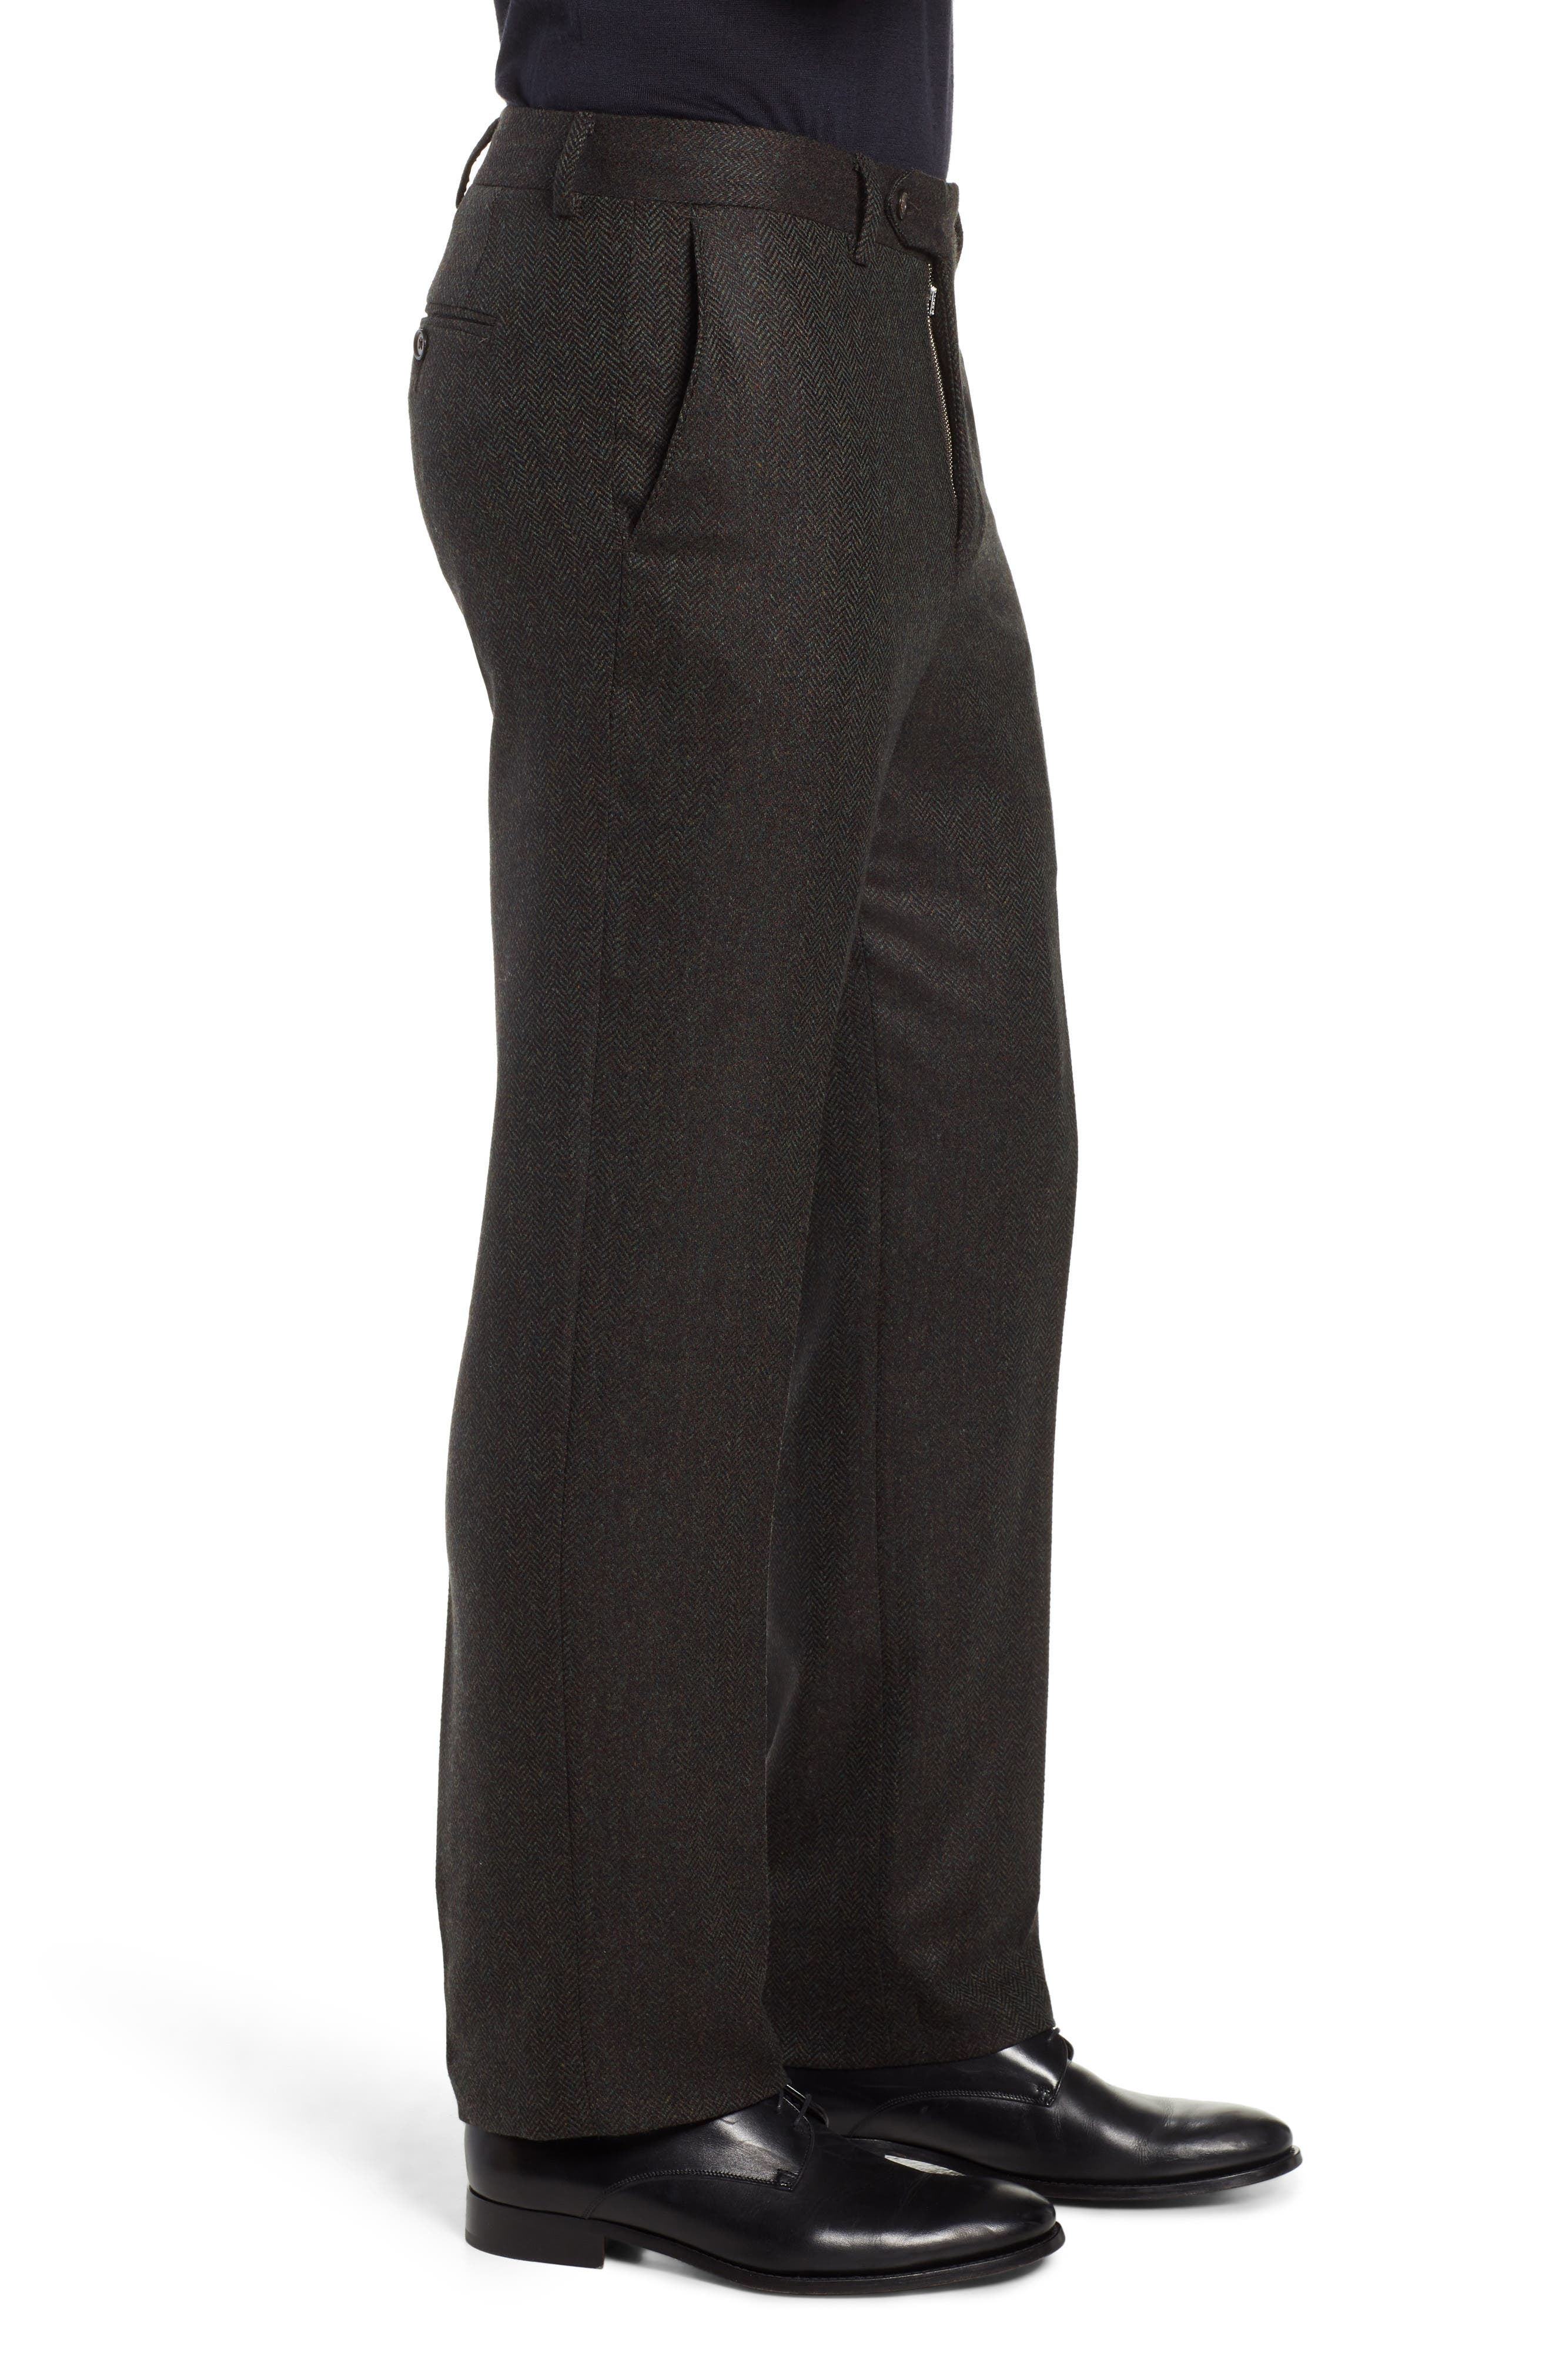 Flat Front Herringbone Wool & Cashmere Trousers,                             Alternate thumbnail 3, color,                             DARK OLIVE